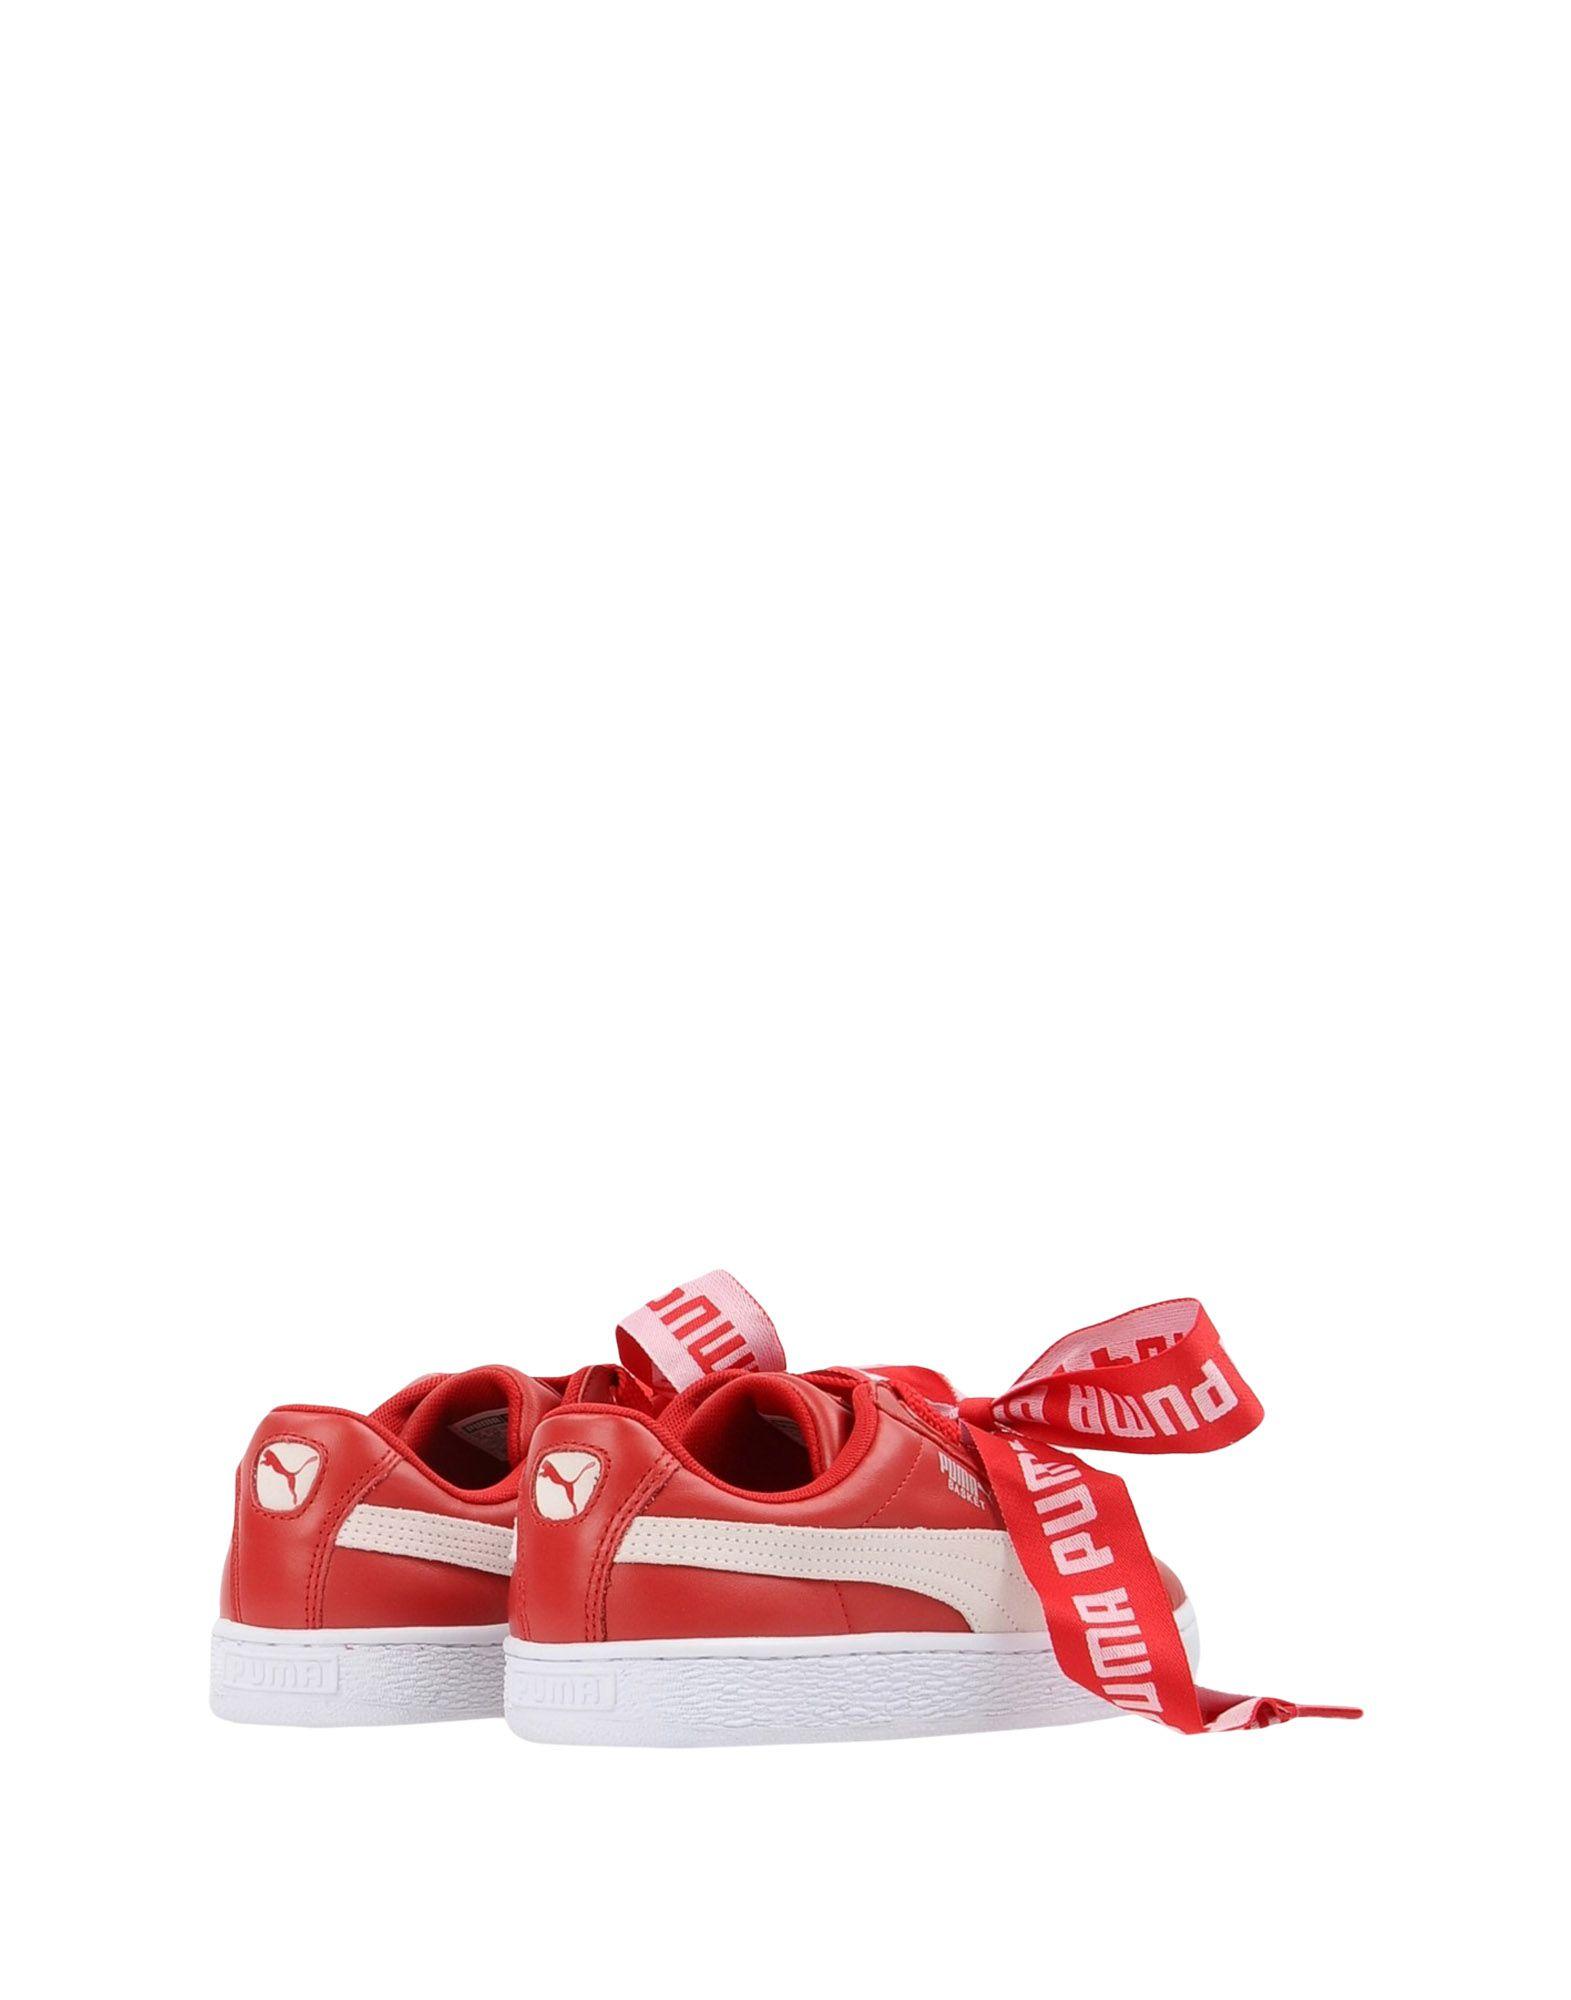 Sneakers Puma Basket Heart De Wns - Femme - Sneakers Puma sur